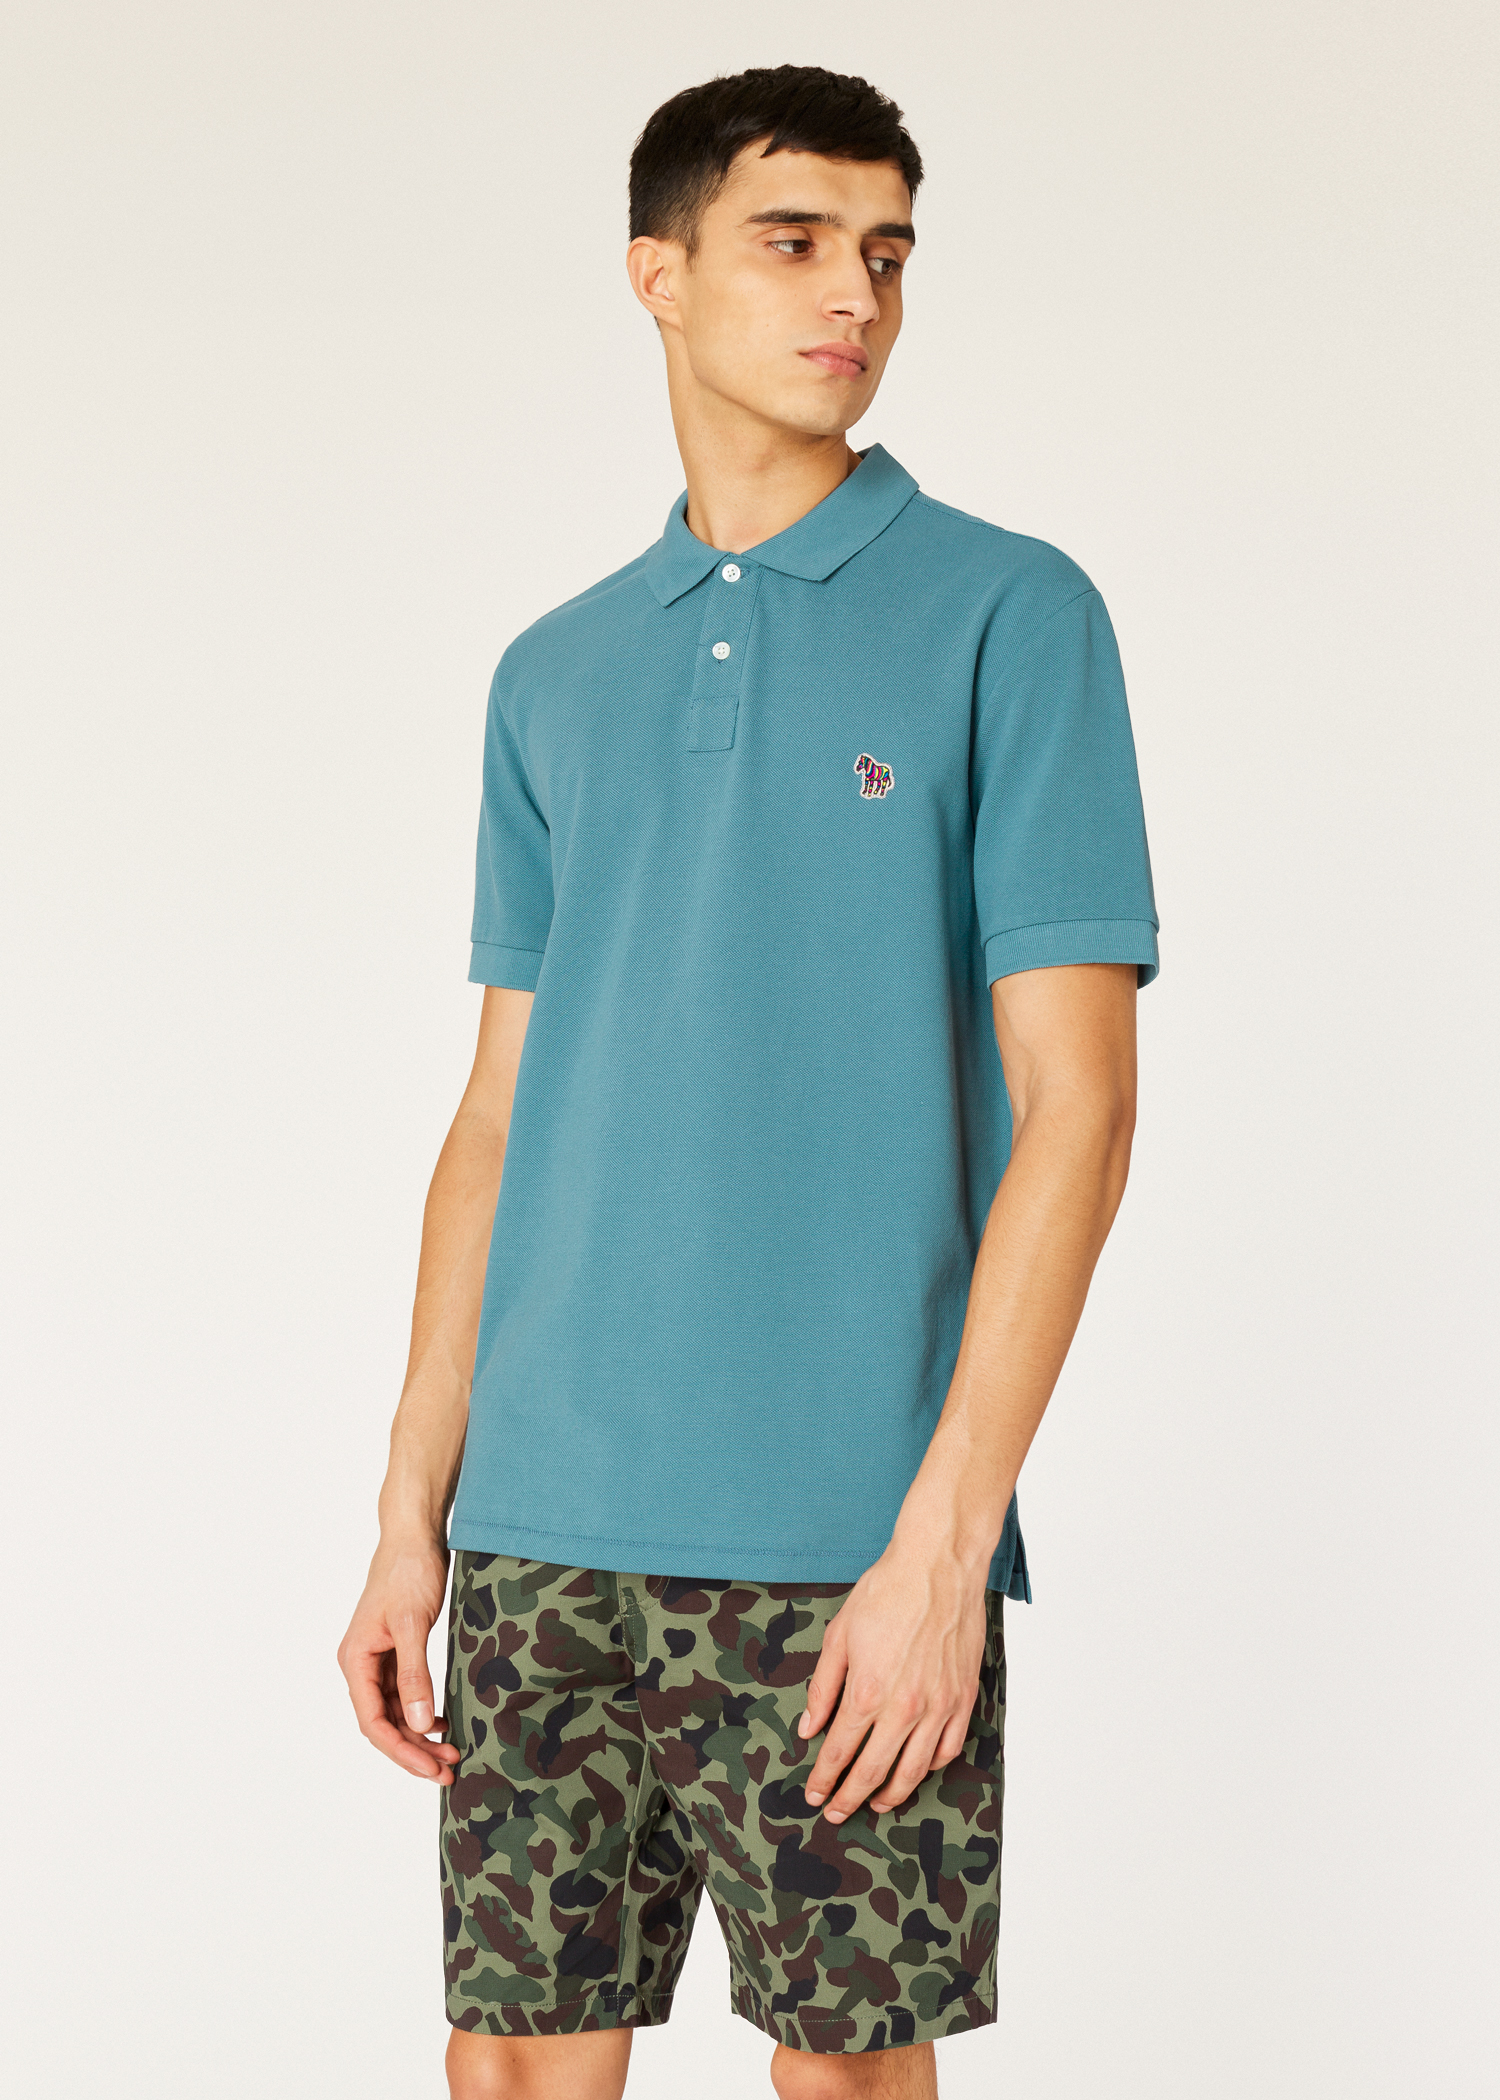 b1116704 Model front close up - Men's Teal Organic Cotton-Piqué Zebra Logo Polo  Shirt Paul